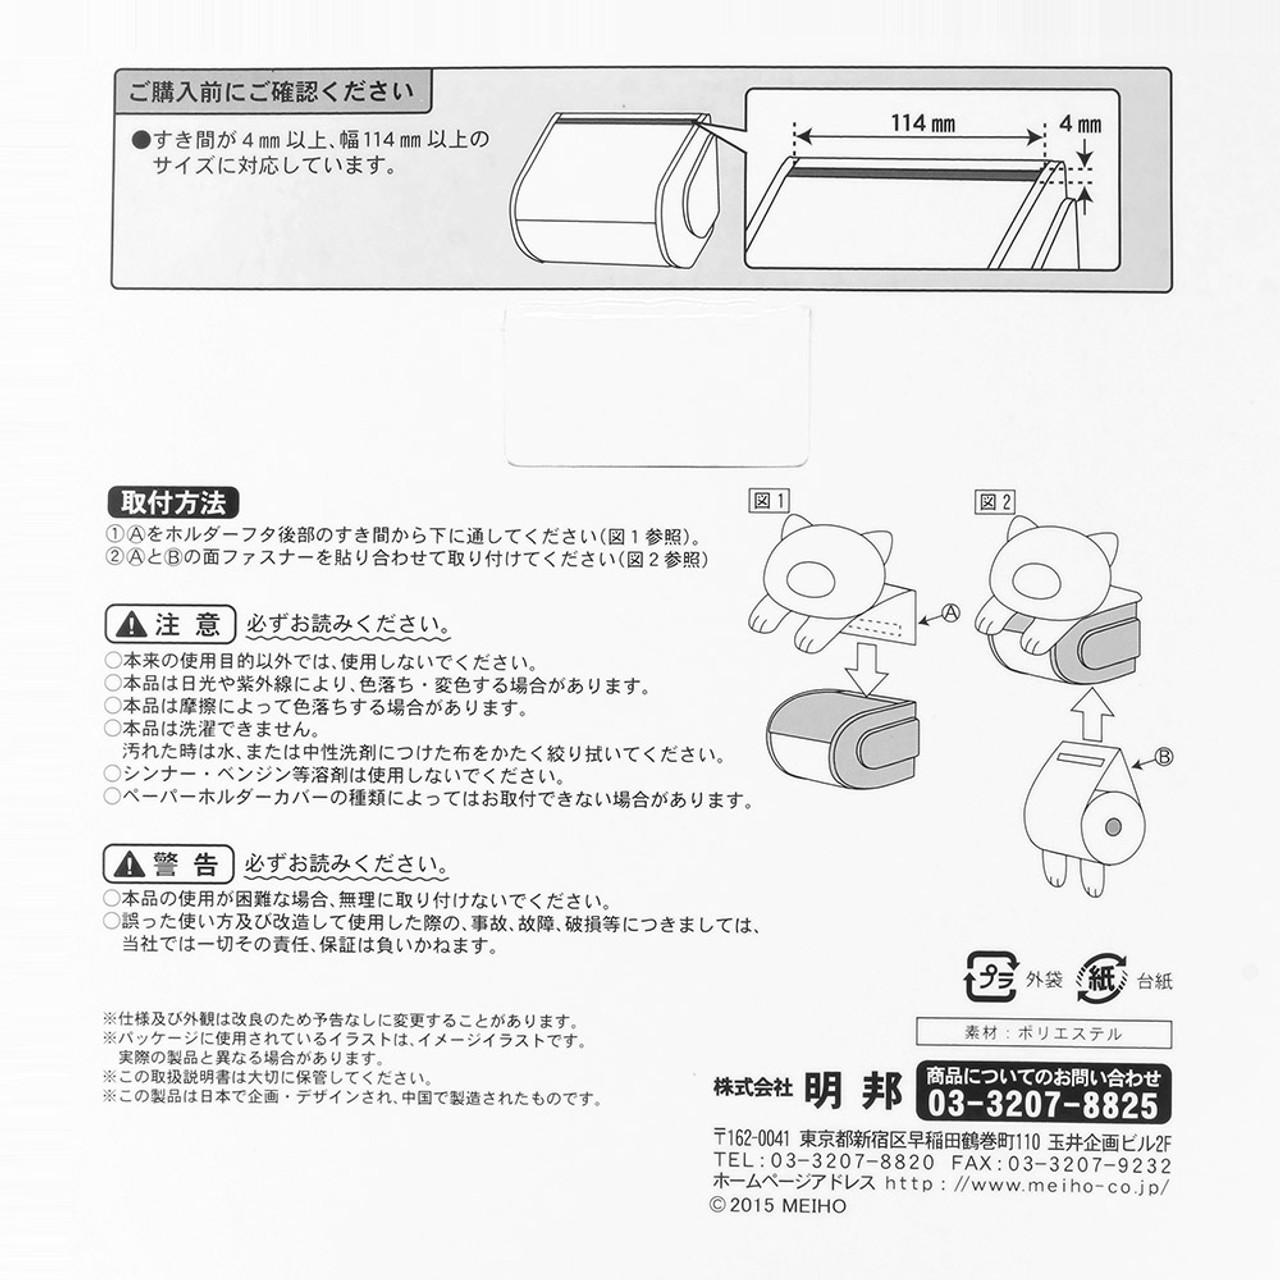 Meiho Shiba Inu Dog Toilet Roll Holder Plush Cover ( Guideline )